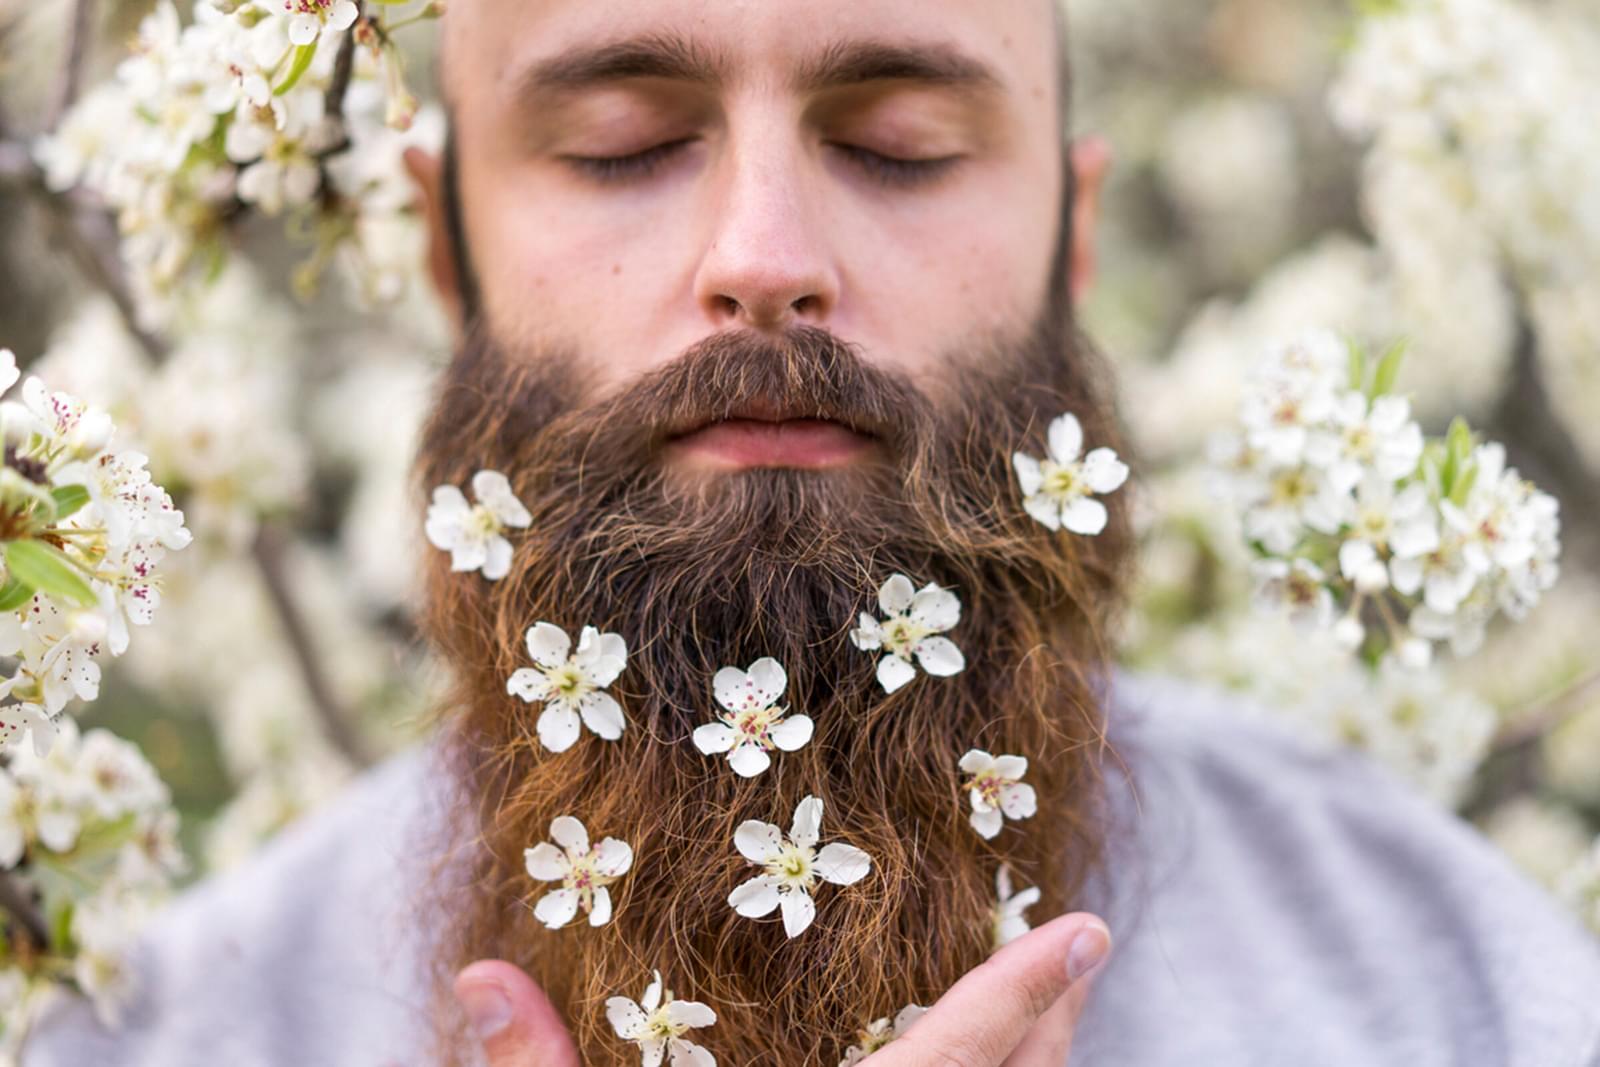 Bearded gentlemen in a sleeping pose with flowers in his beard